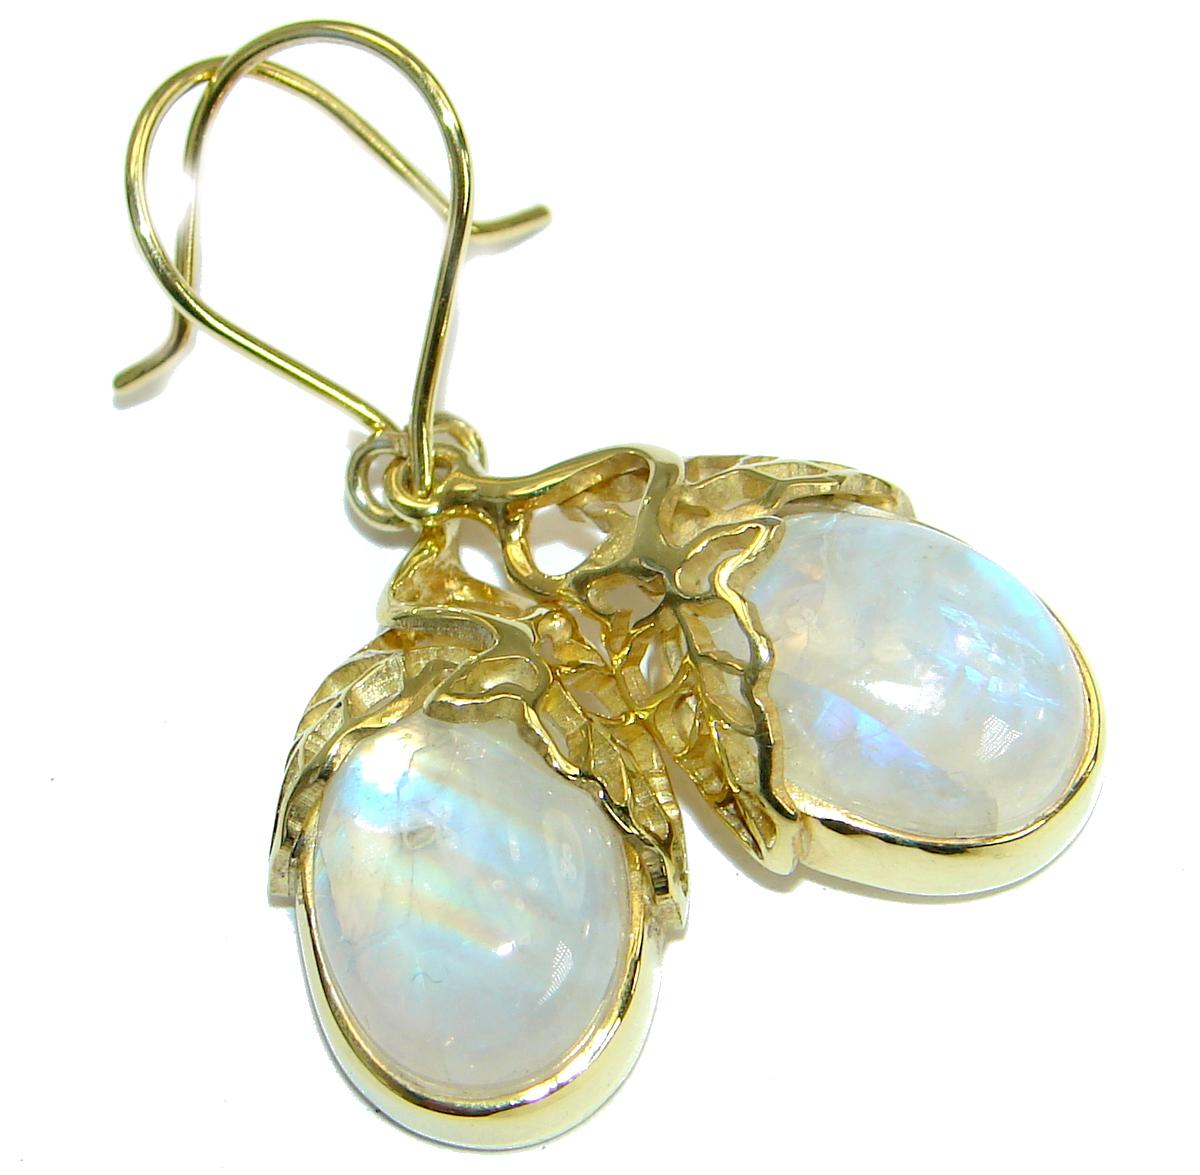 Stylish AAA+ Fire Moonstone 14K Gold over .925 Sterling Silver handmade earrings